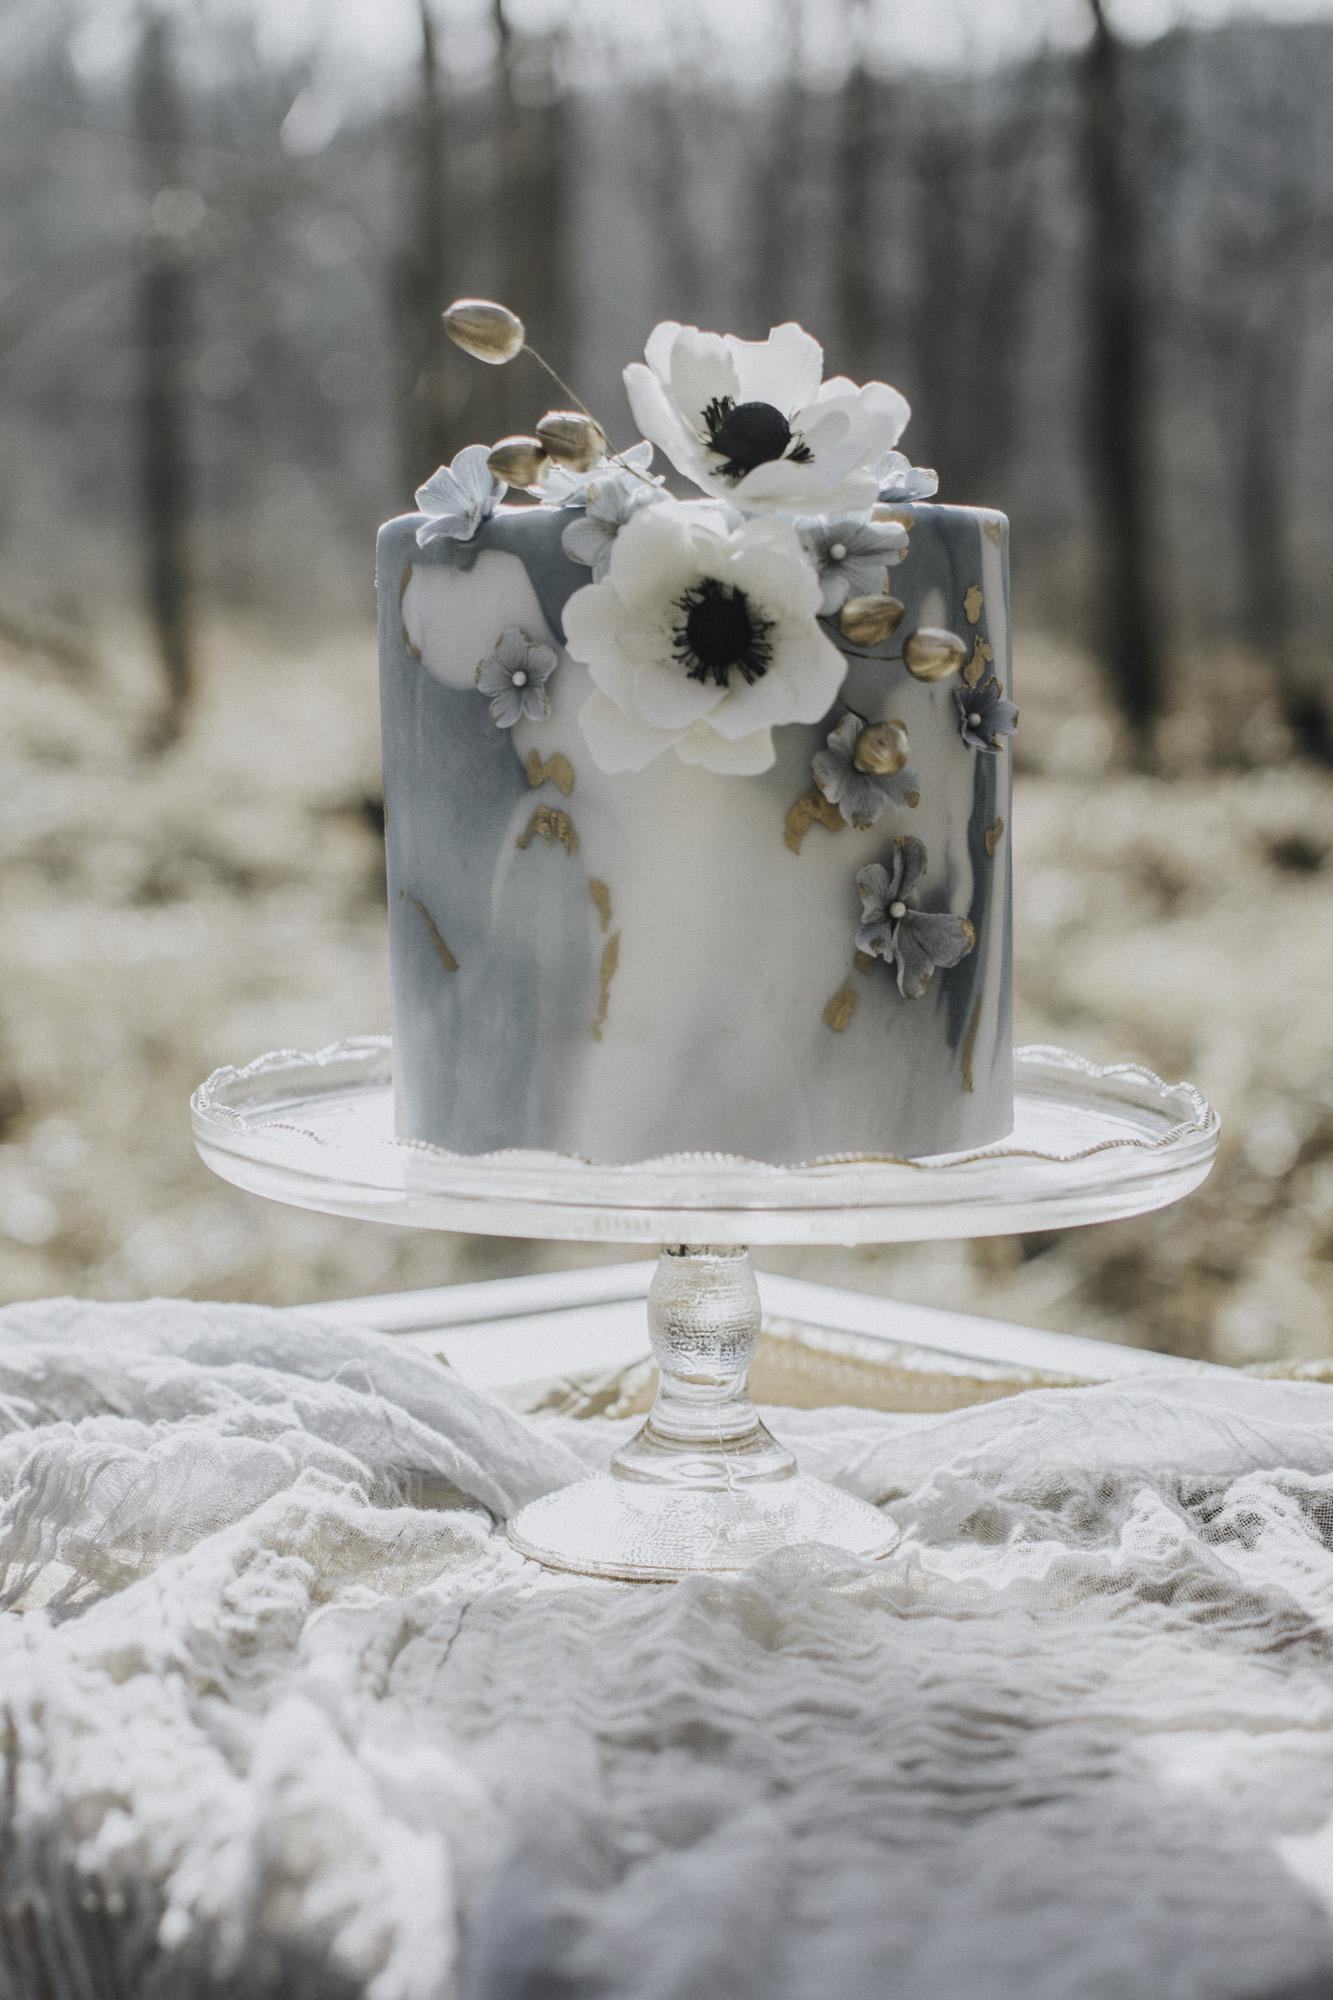 Cate_Ann_Photography_Dayton_Ohio_Wedding_Elopement_And_Engagement_PhotographerDSC_5531.jpg